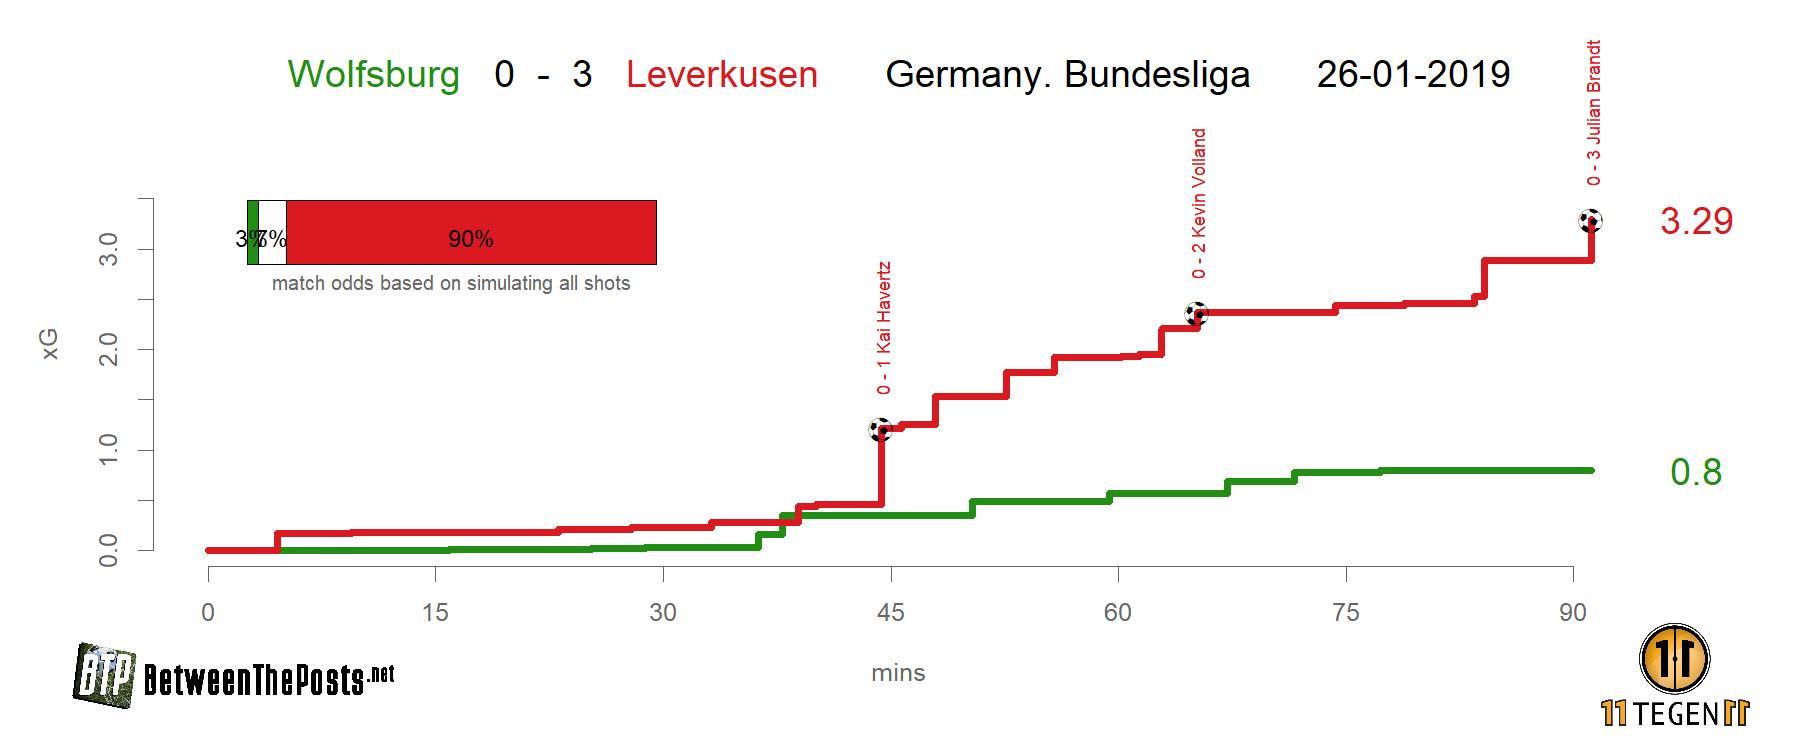 Expected goals plot VfL Wolfsburg - Bayer Leverkusen 0-3 Bundesliga